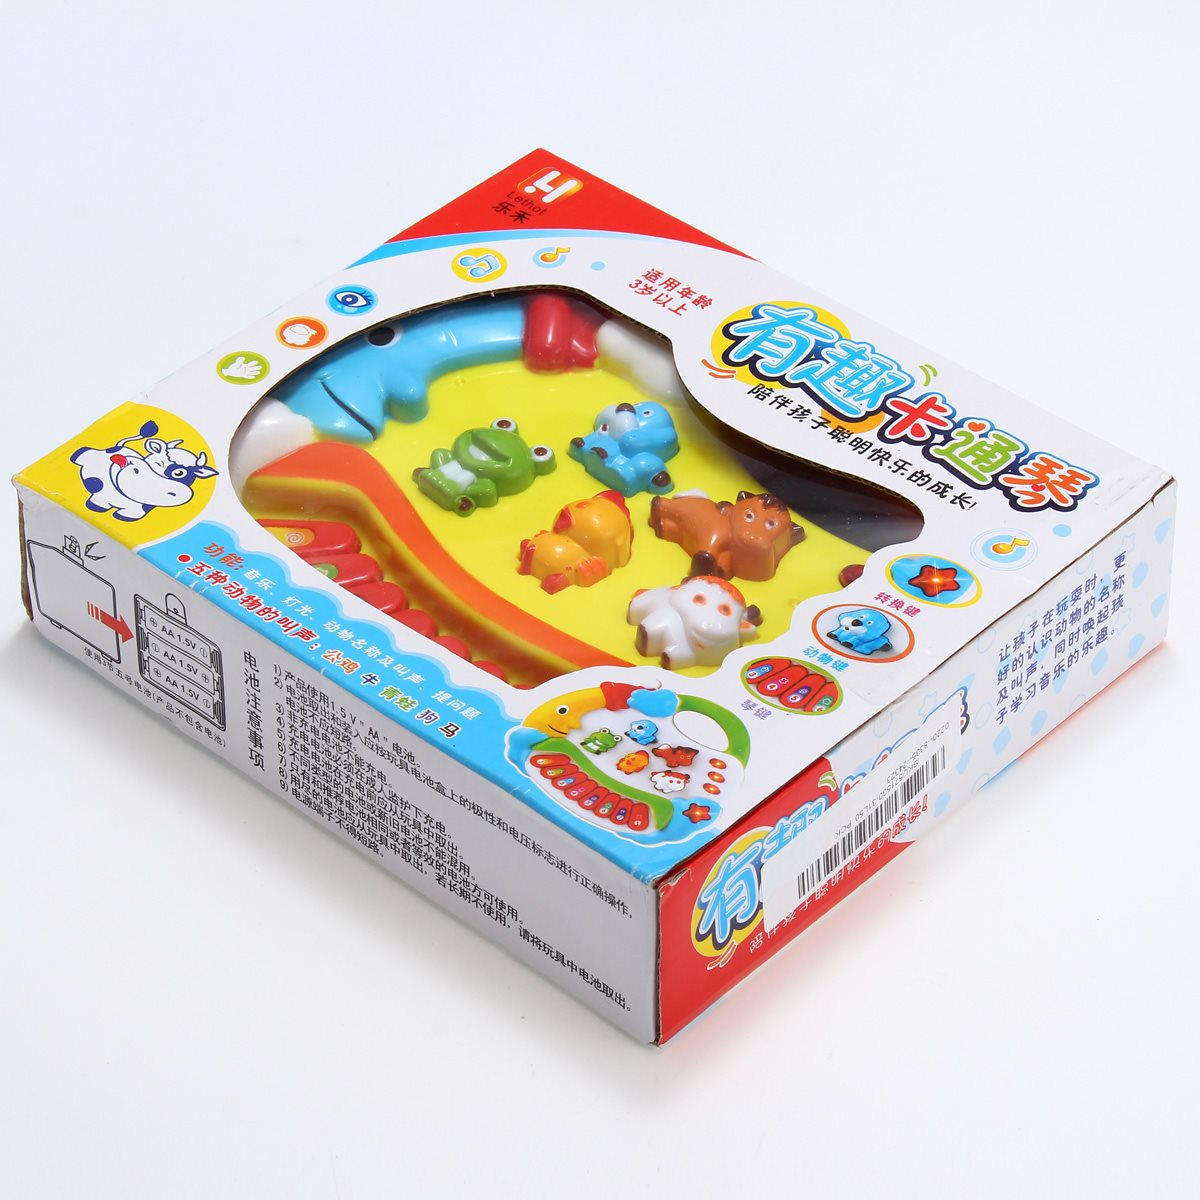 Funny-Lovely-Baby-Children-Kids-Musical-Educational-Animal-Farm-Piano-Toys-Developmental-Music-Toy-For-Children-5